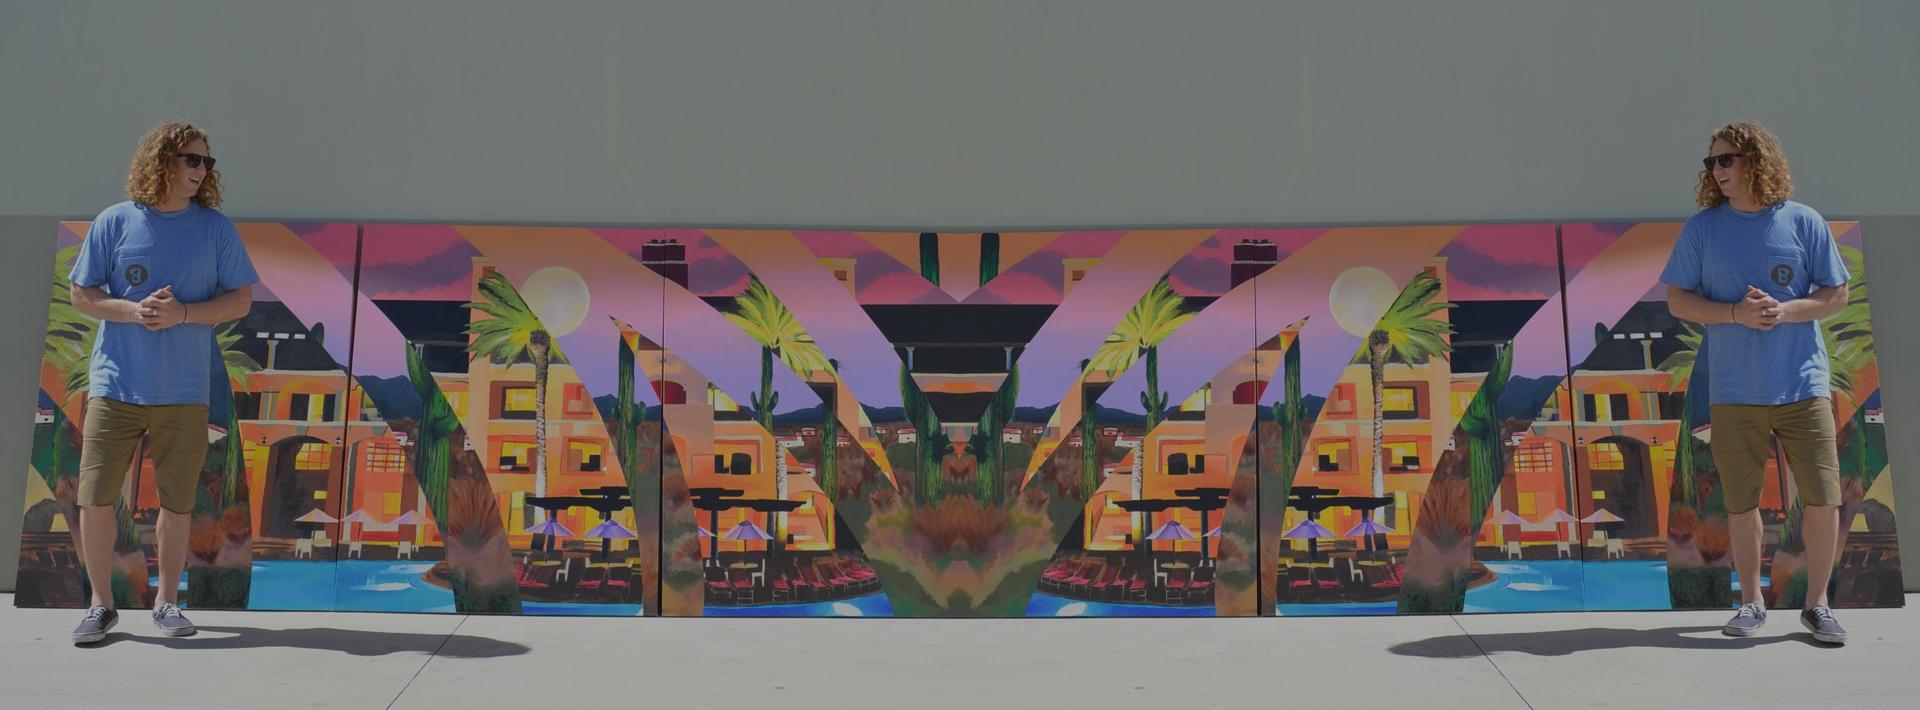 METCHAMixtape \ Blake Barash. The soundtrack behind Barash's uniquely painted snkrs.